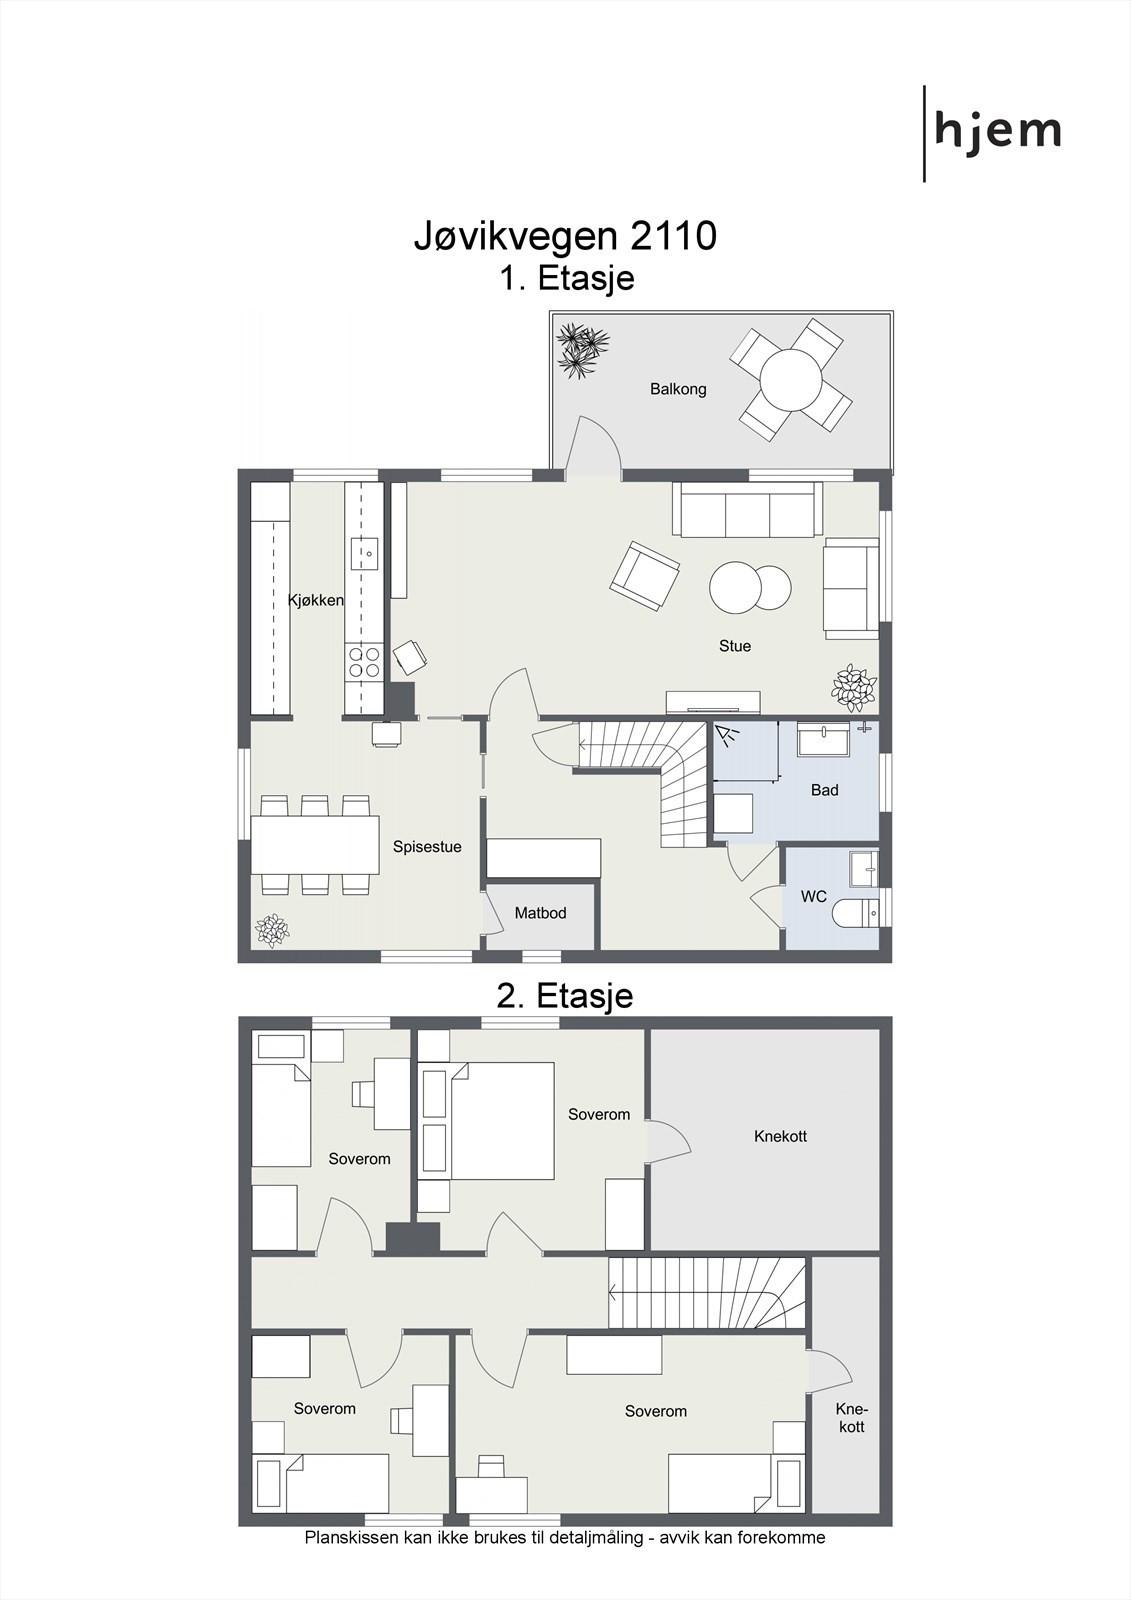 Project letterhead - Jøvikvegen 2110 - 2D Floor Plan